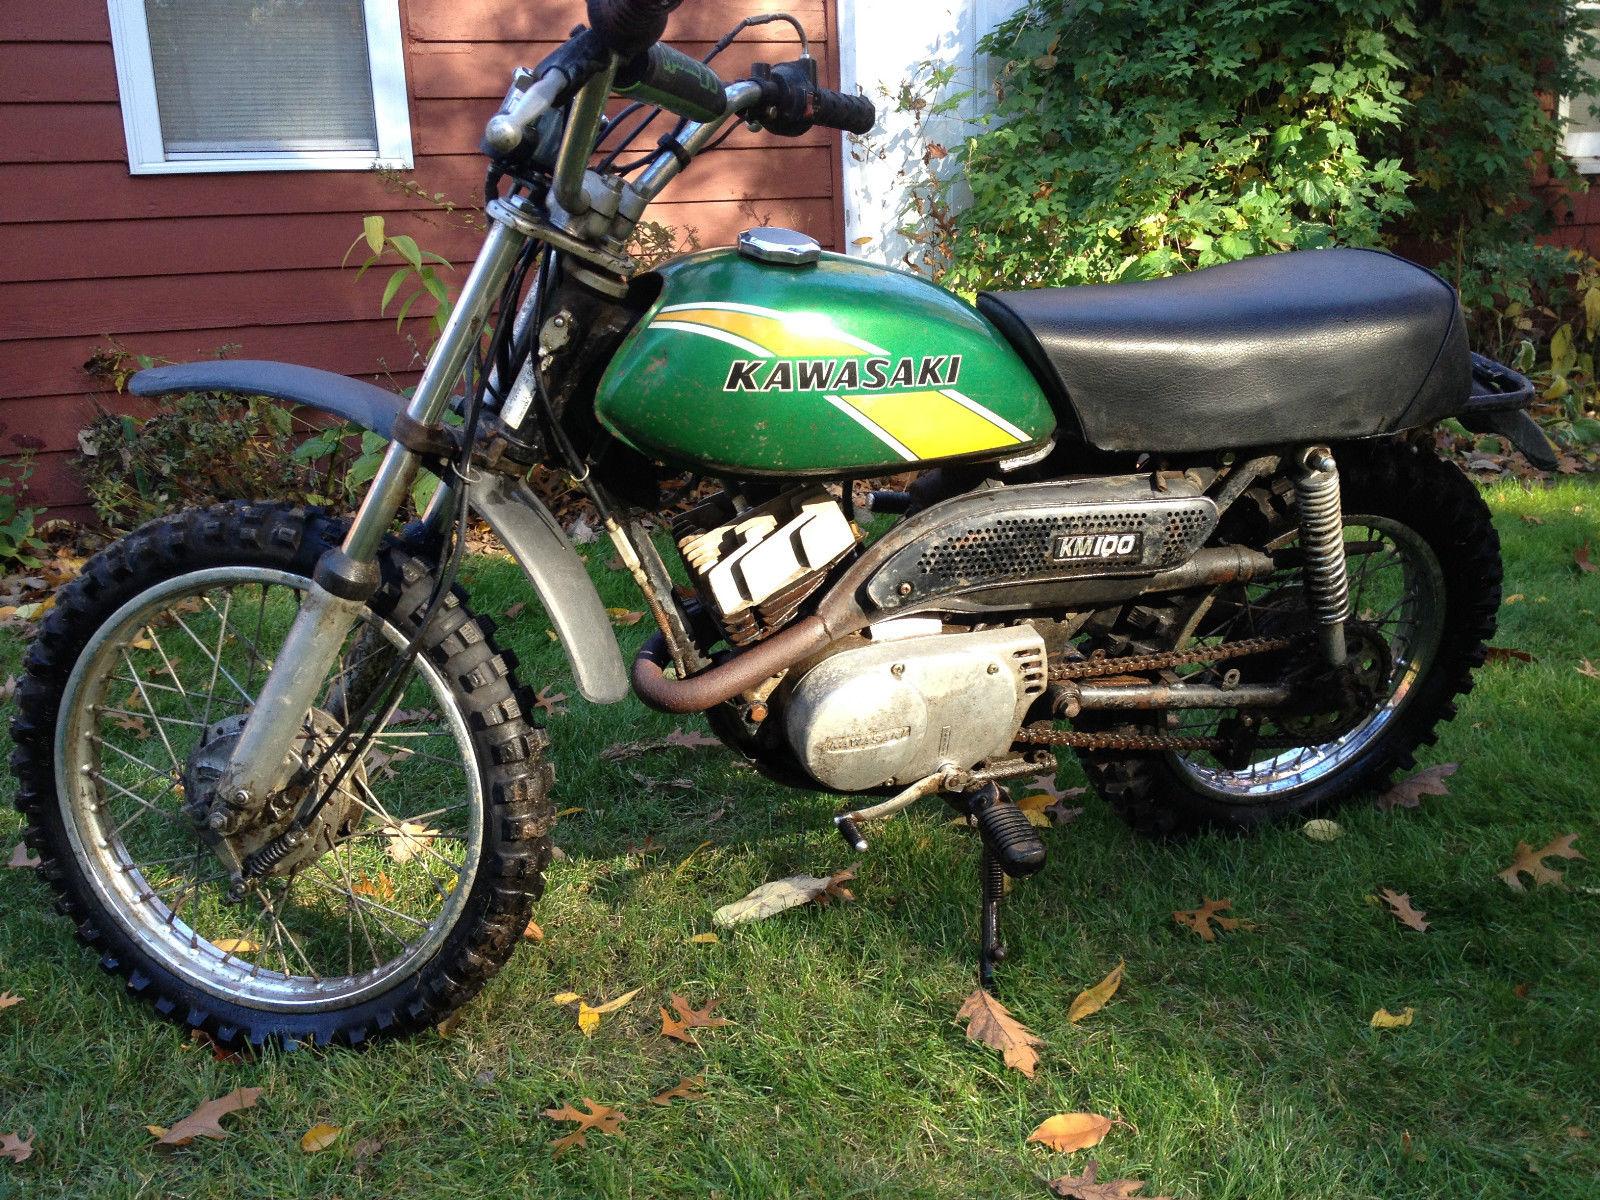 1975 Kawasaki Km100 Motorcycle Mini Bike Dirt Bike